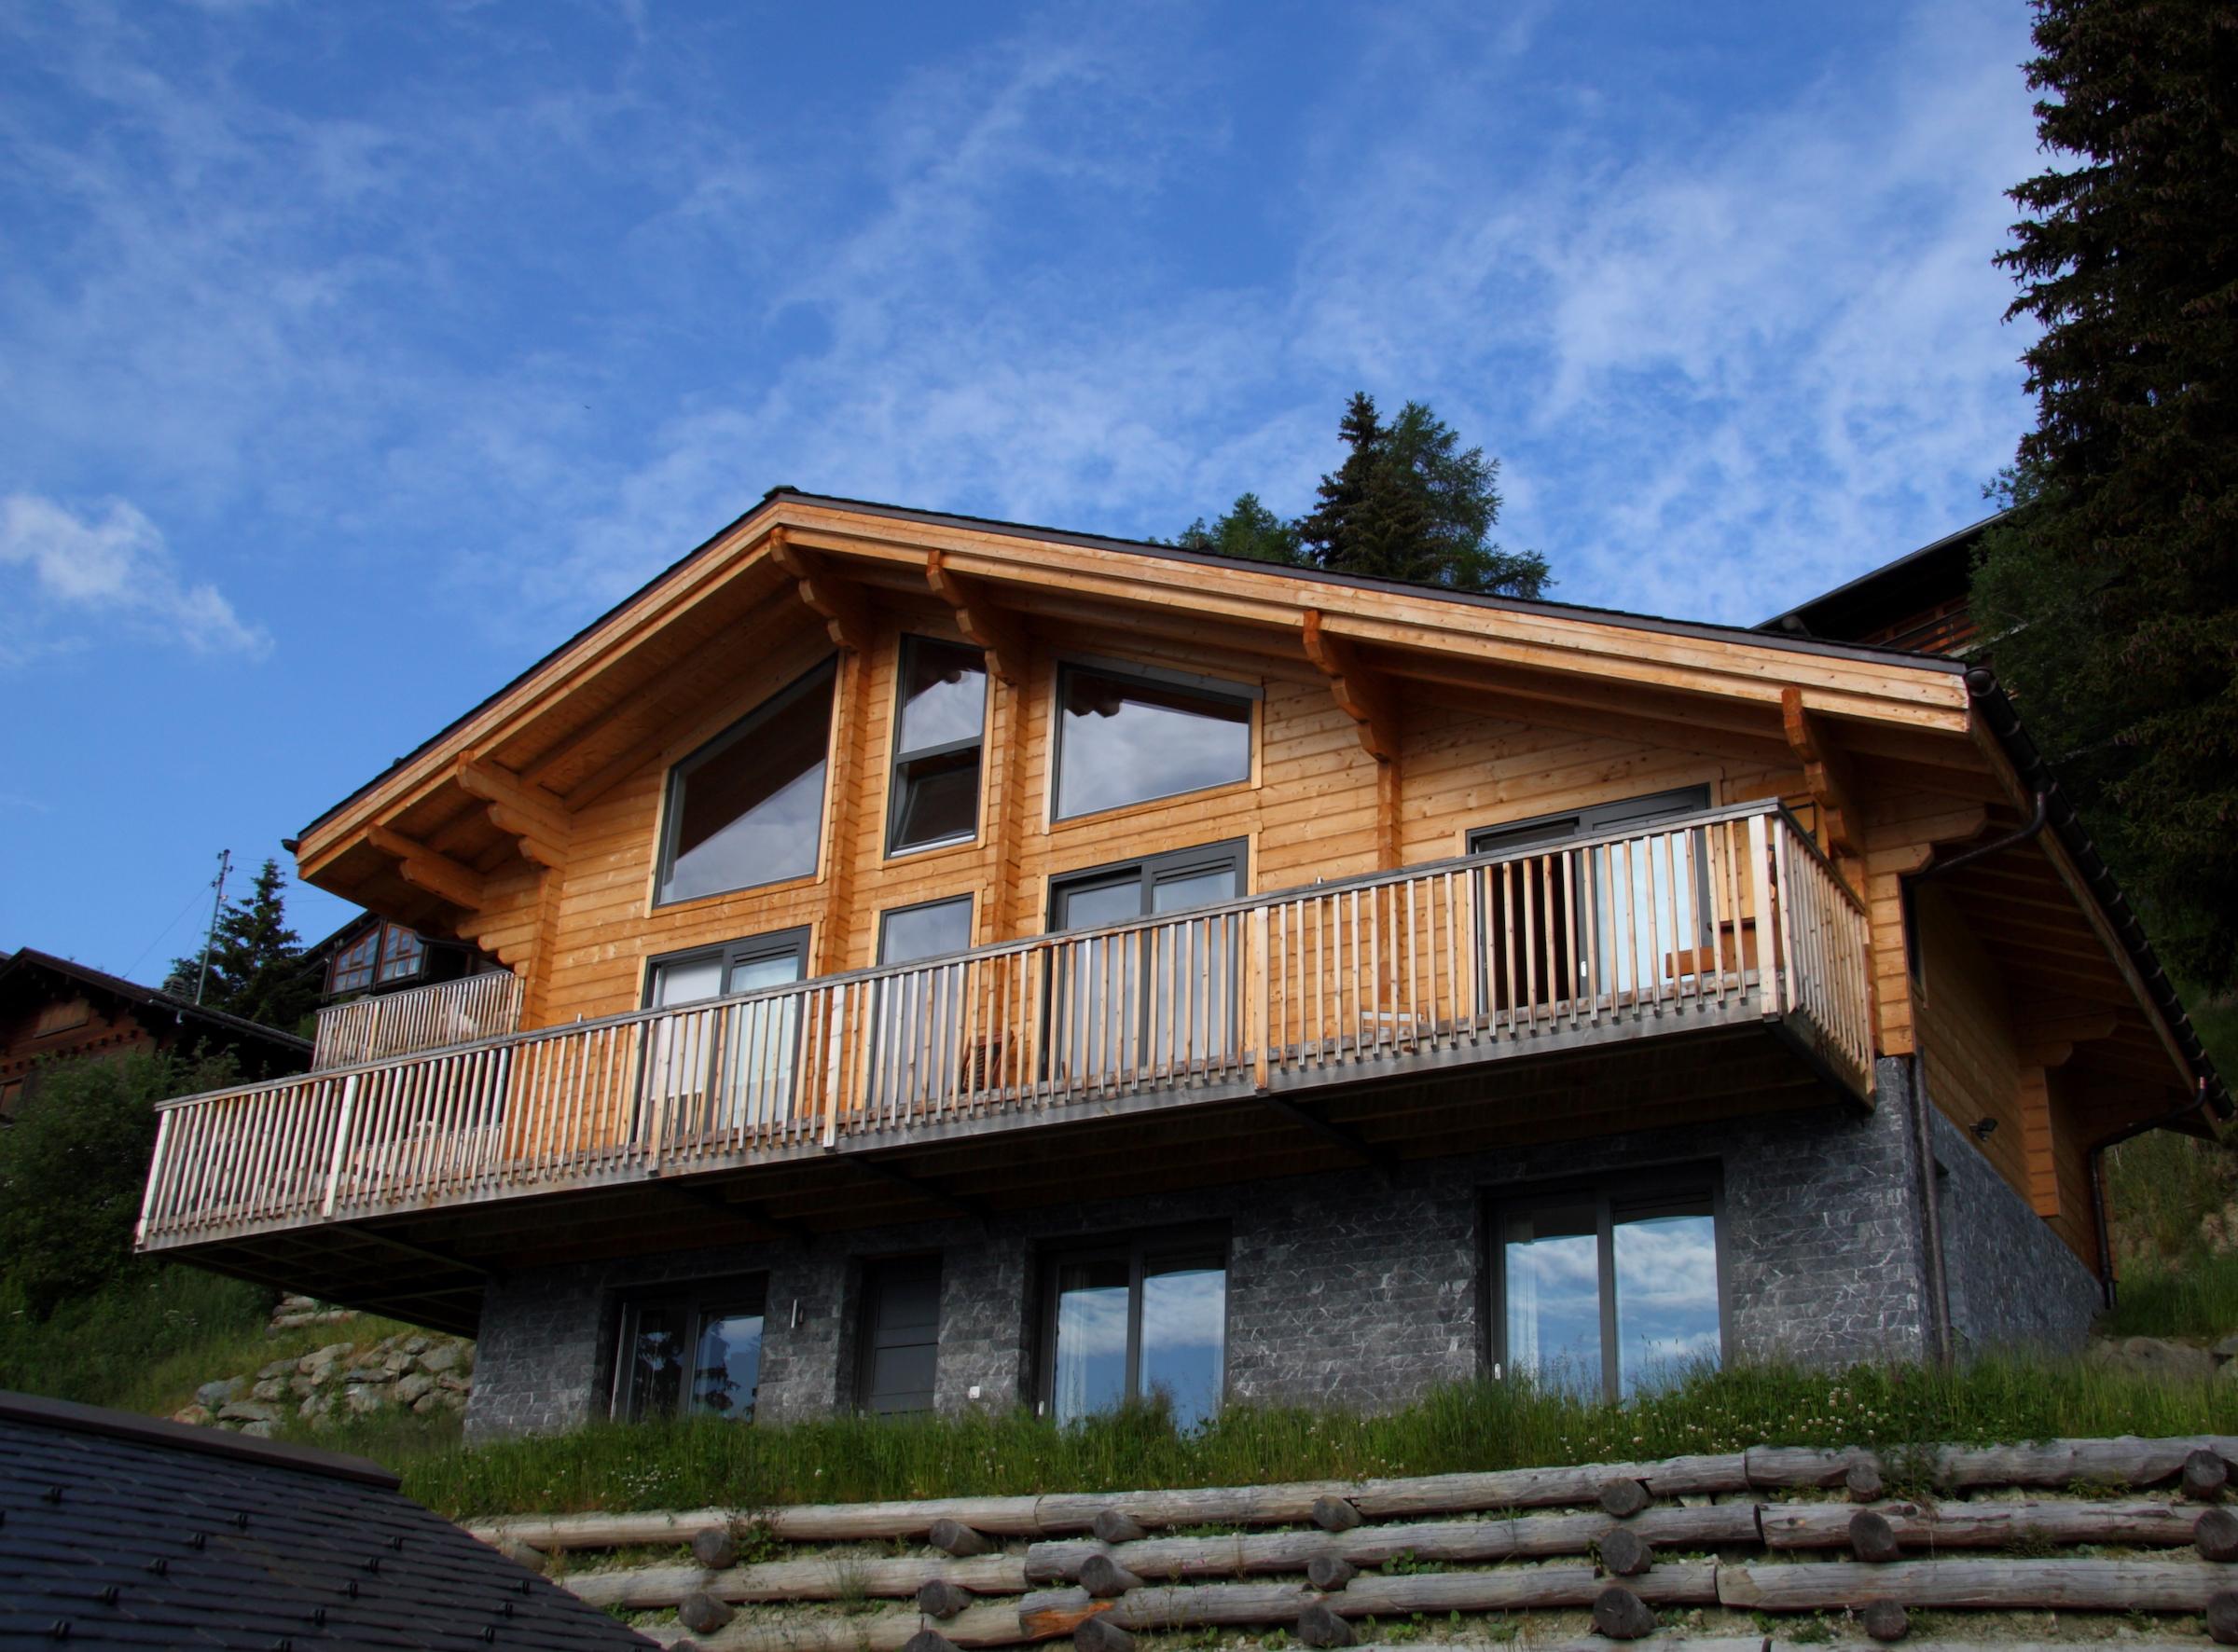 Ski Chalet Switzerland: Le Iceberg